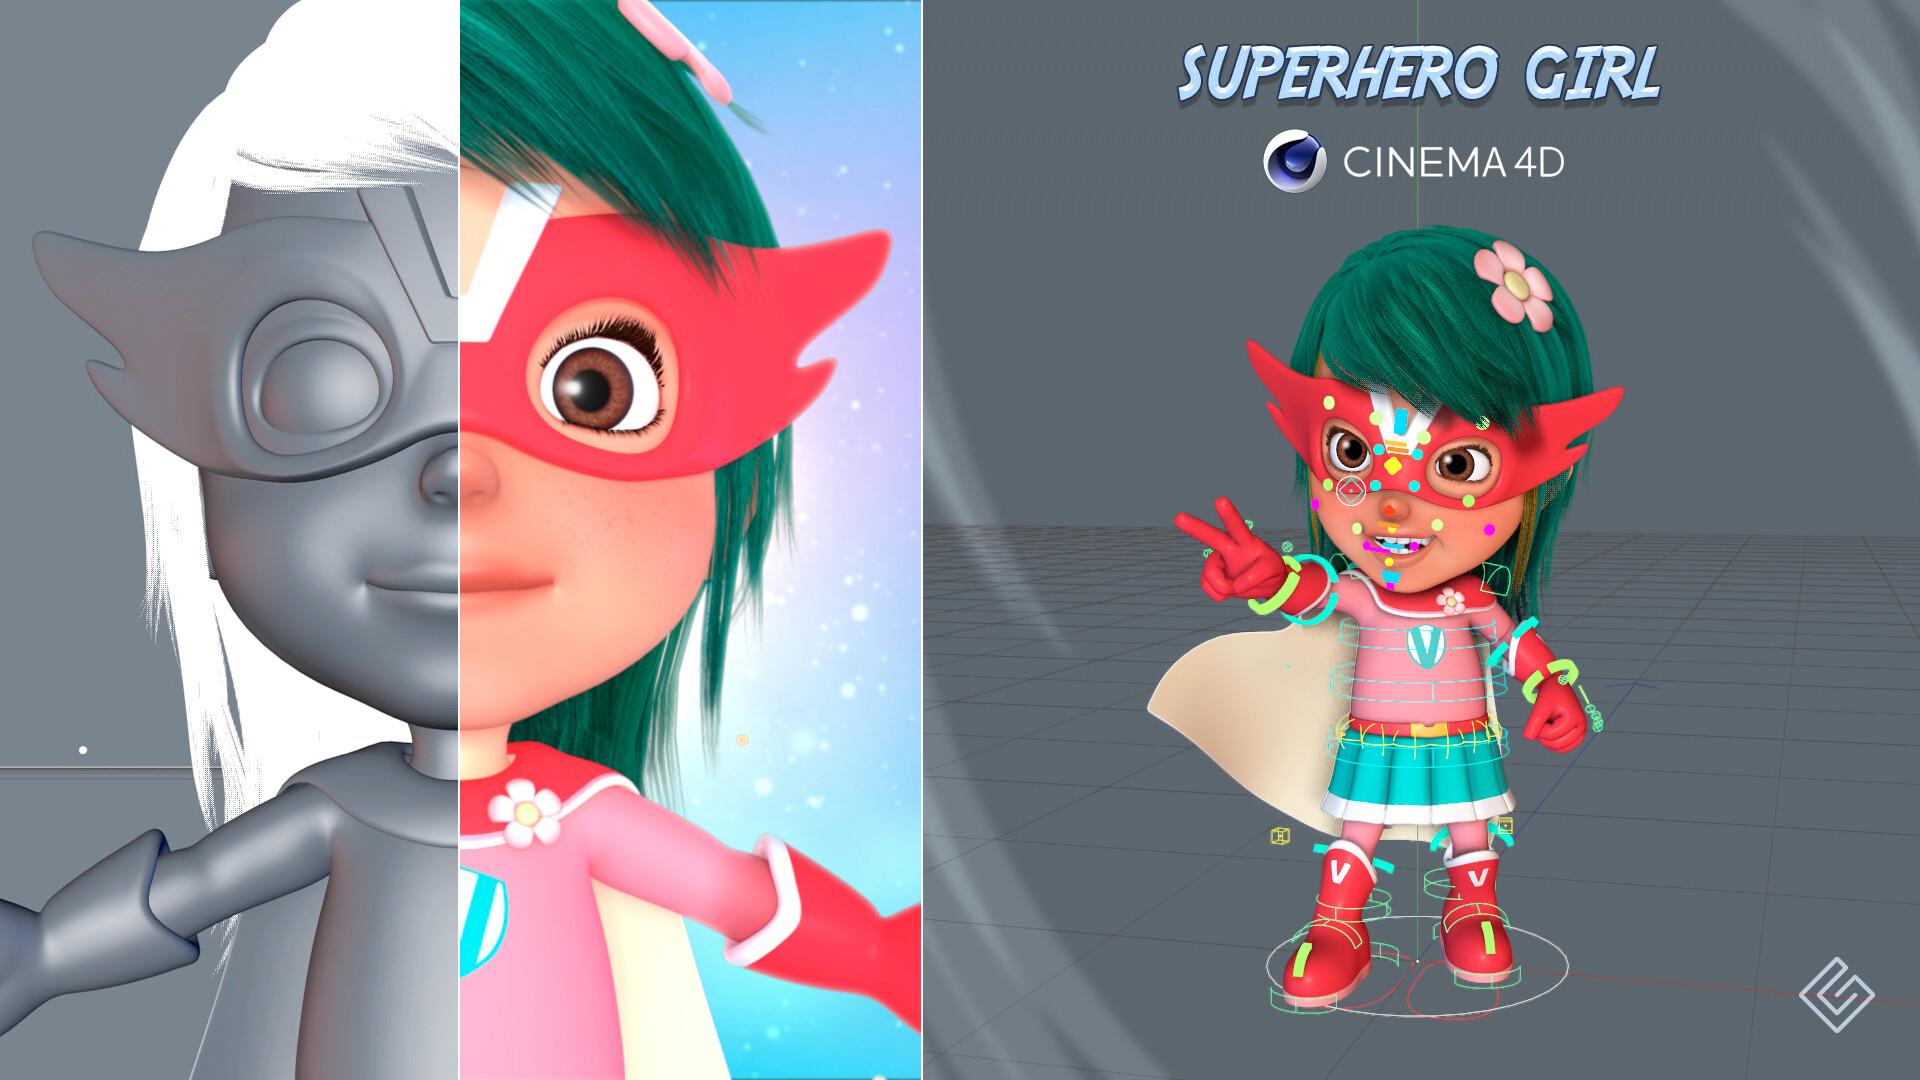 ArtStation - Superhero girl, Giuseppe Sarcì